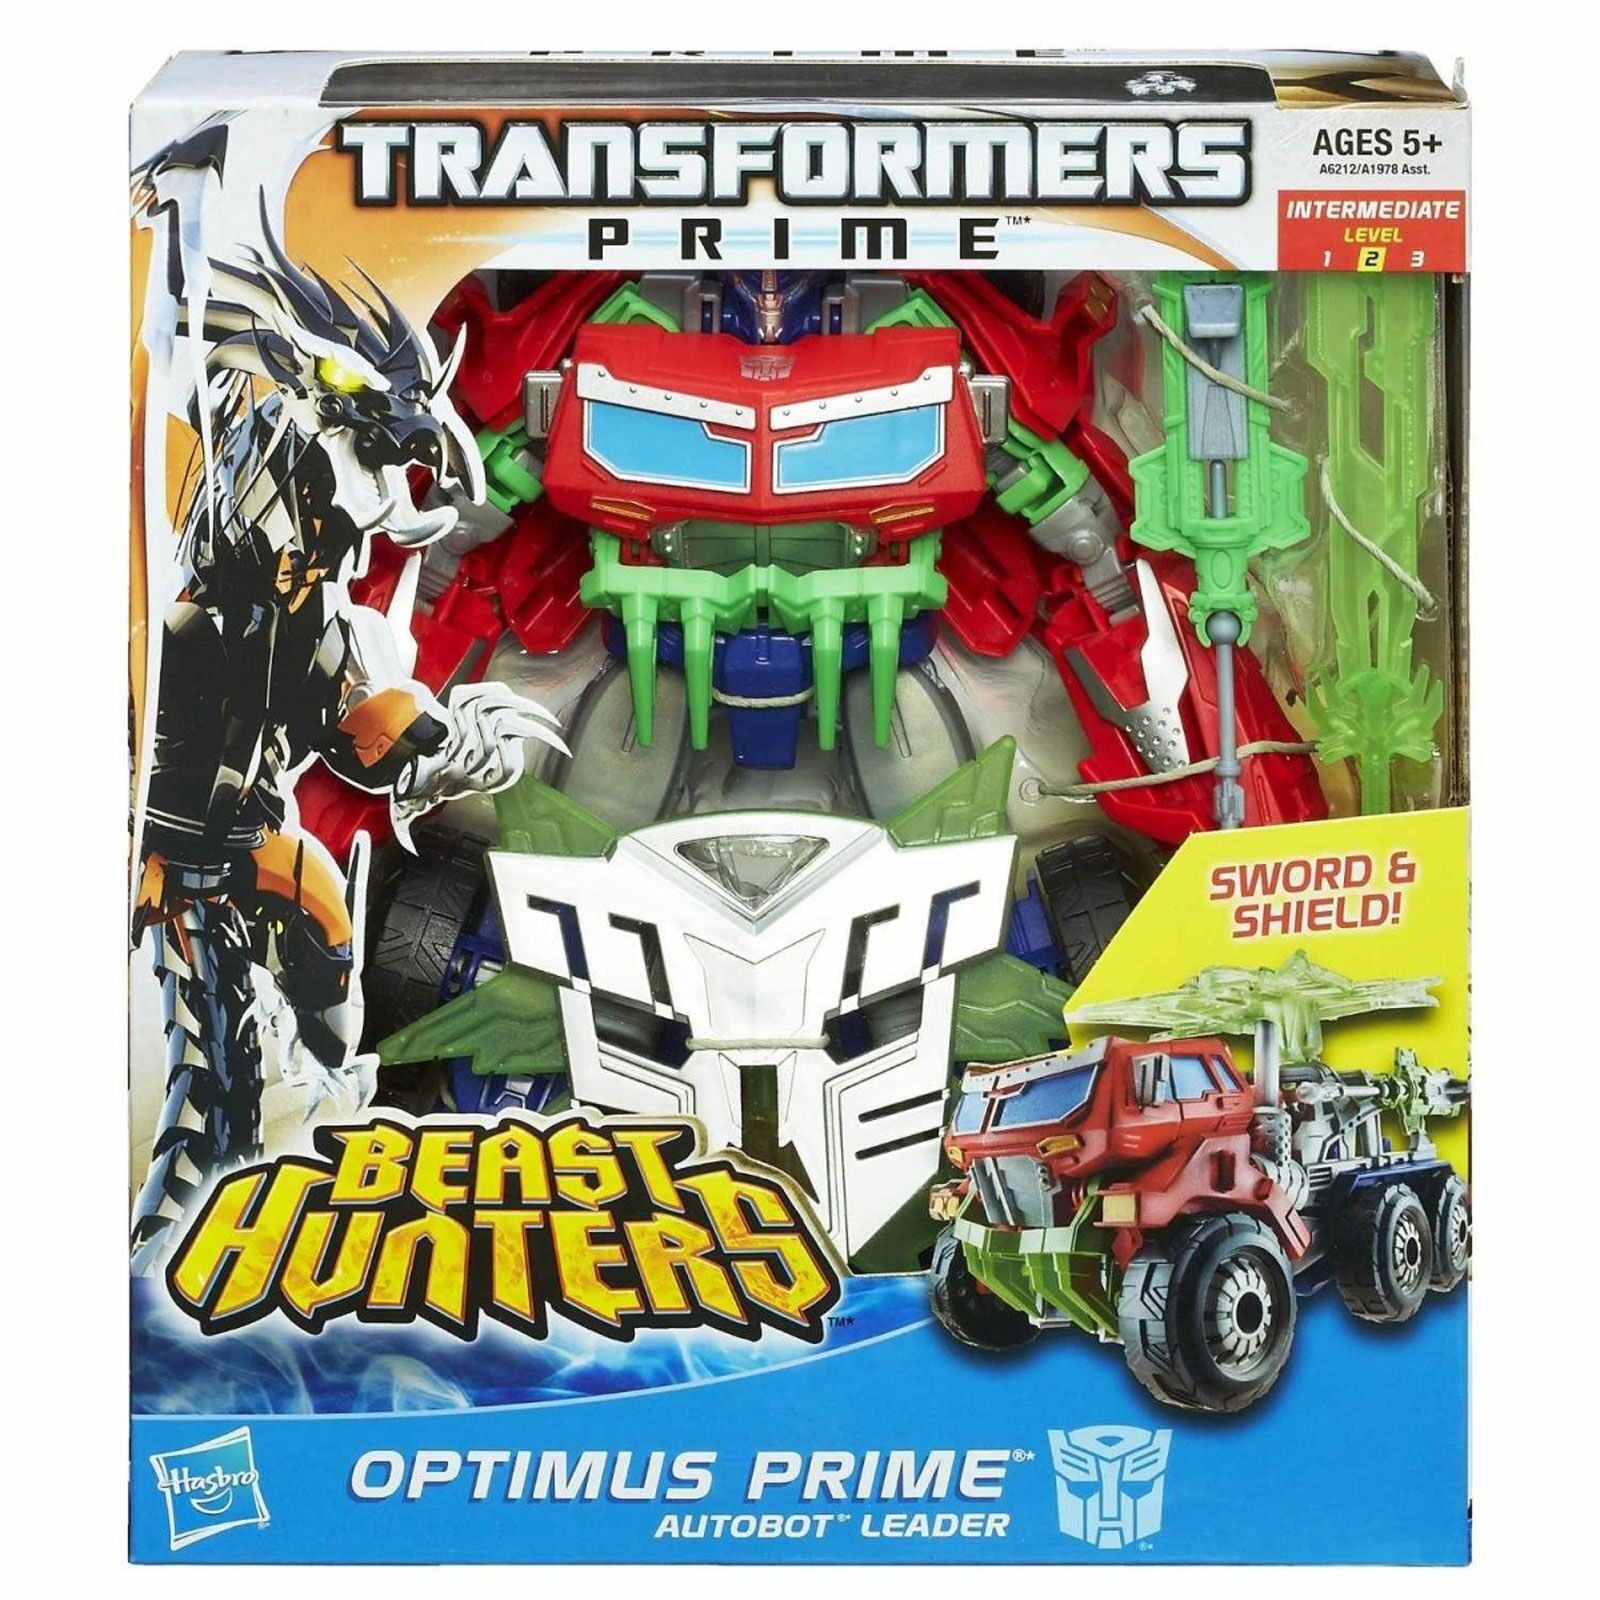 OPTIMUS PRIME • C9 • BEAST HUNTERS • HASBRO TRANSFORMER MINT IN SEALED BOX